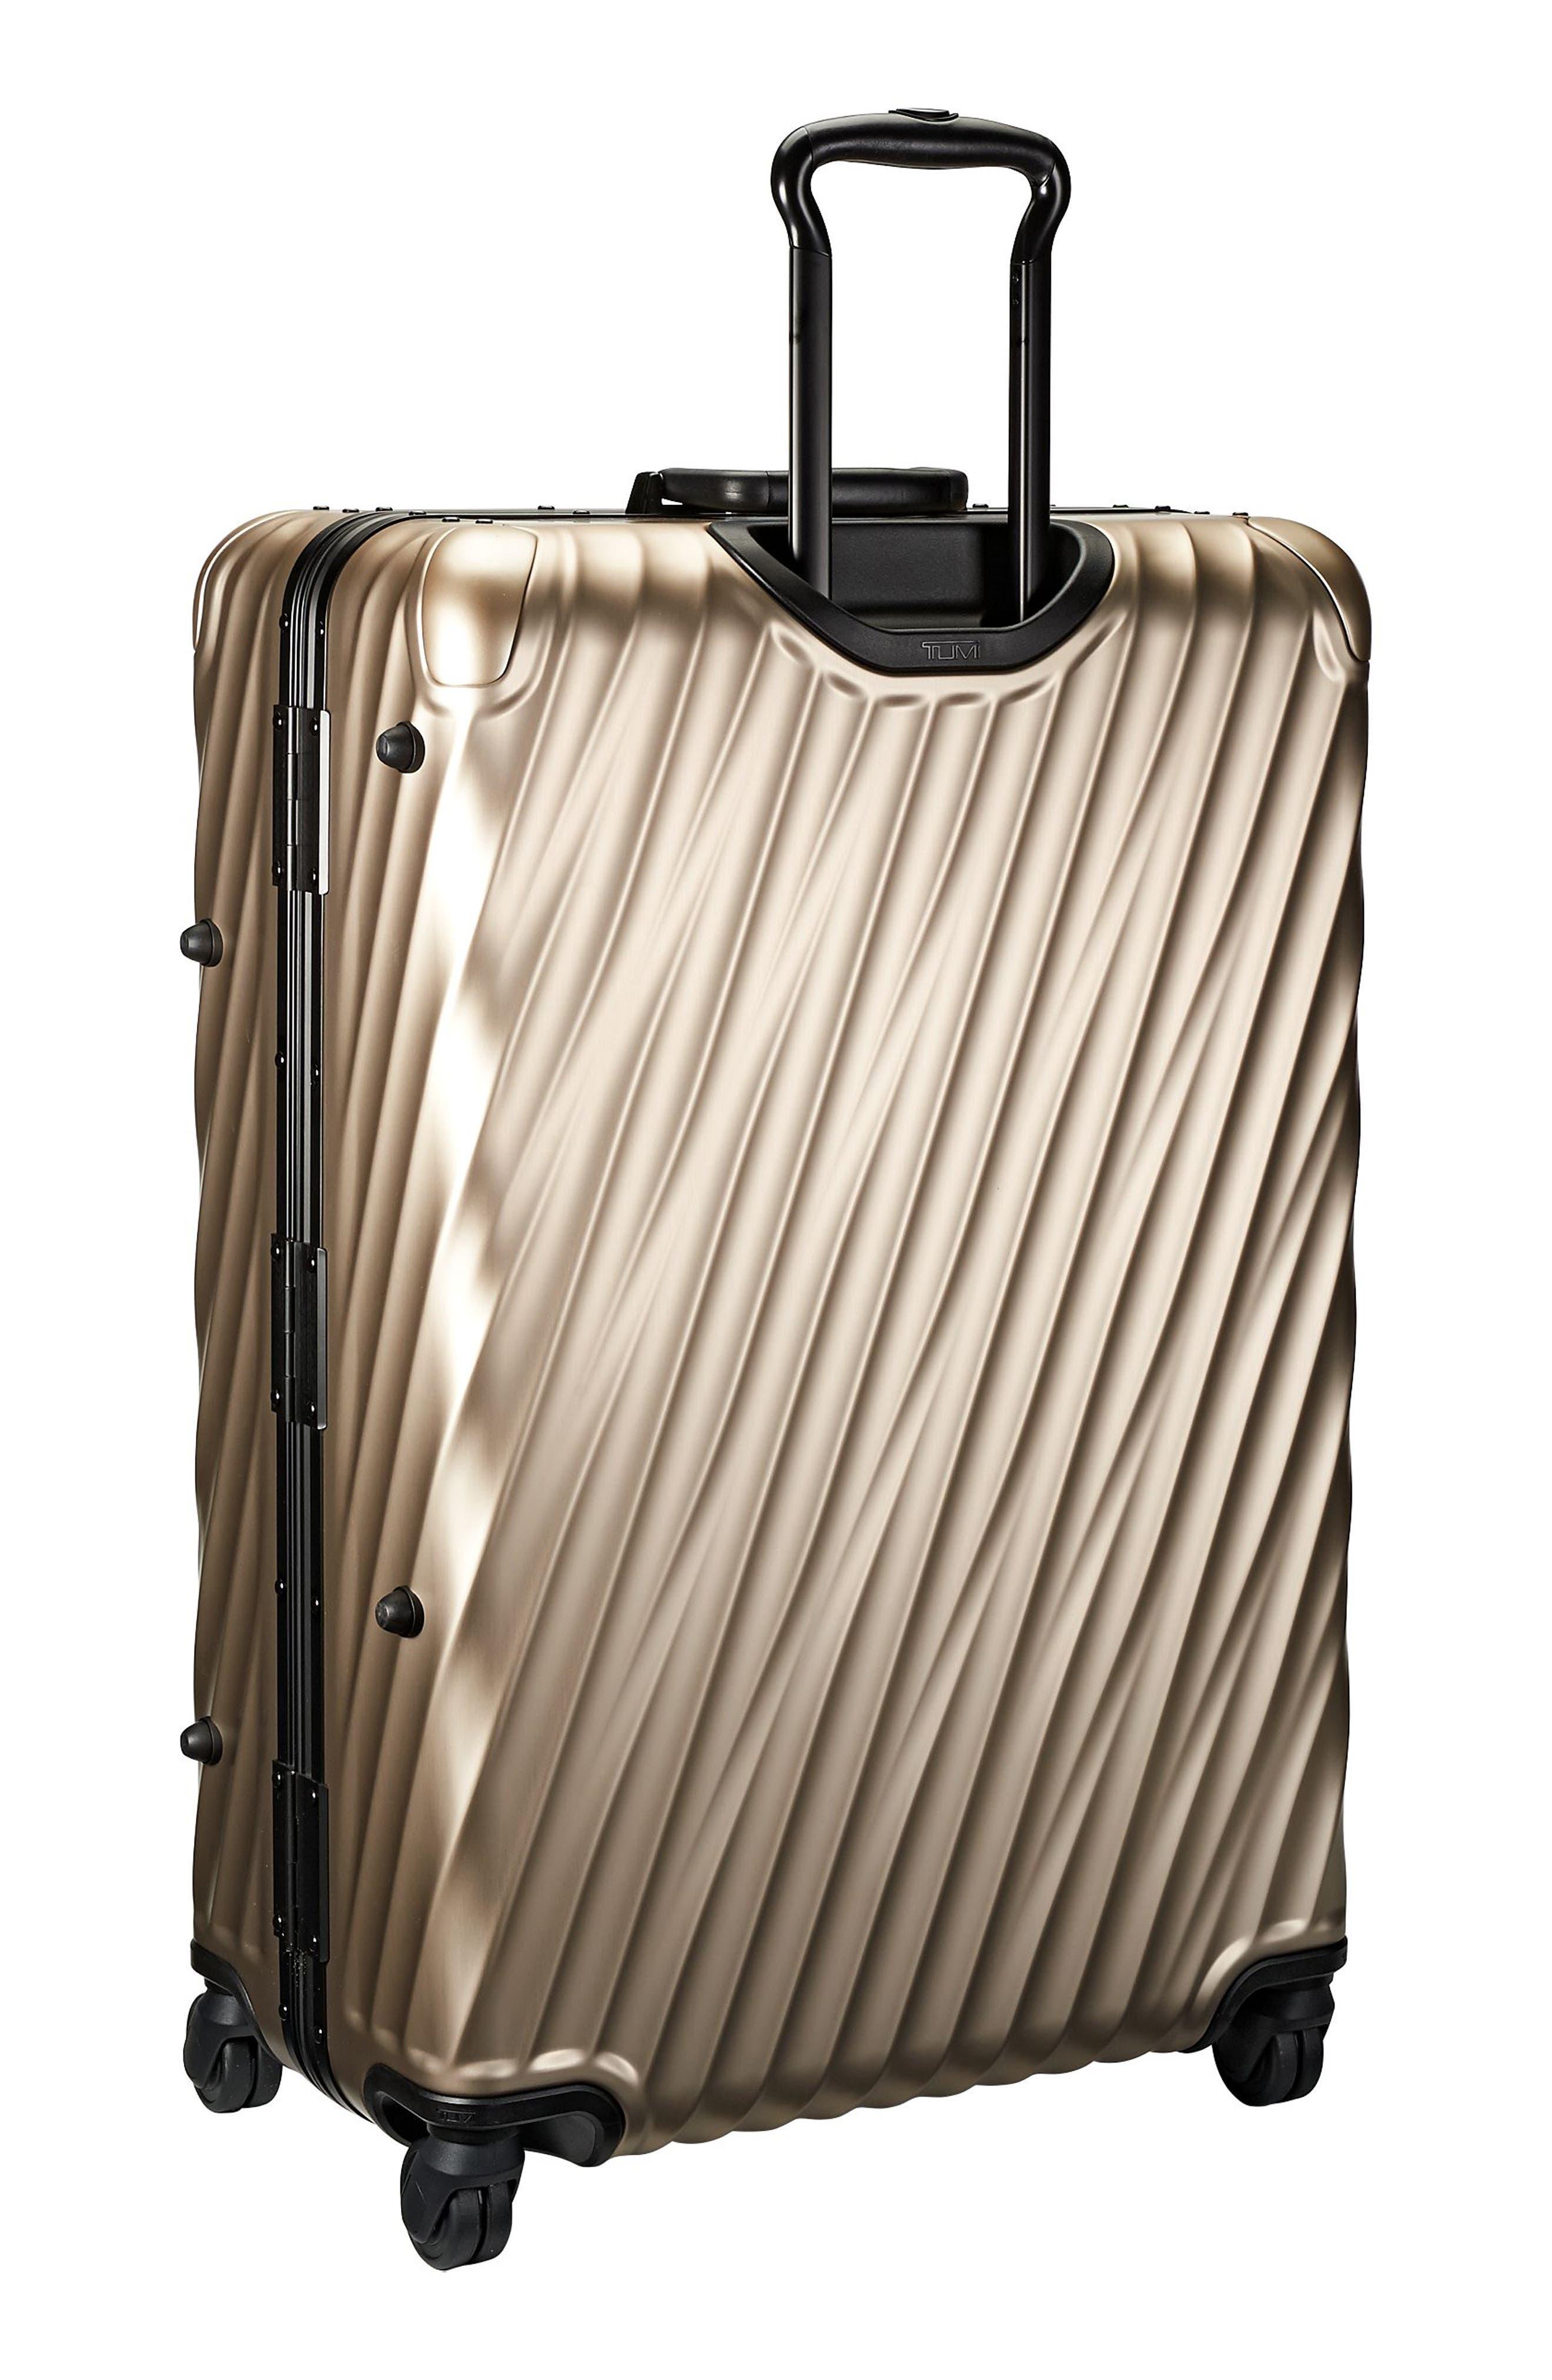 19-Degree 30-Inch Aluminum Spinner Packing Case,                             Alternate thumbnail 3, color,                             Ivory Gold